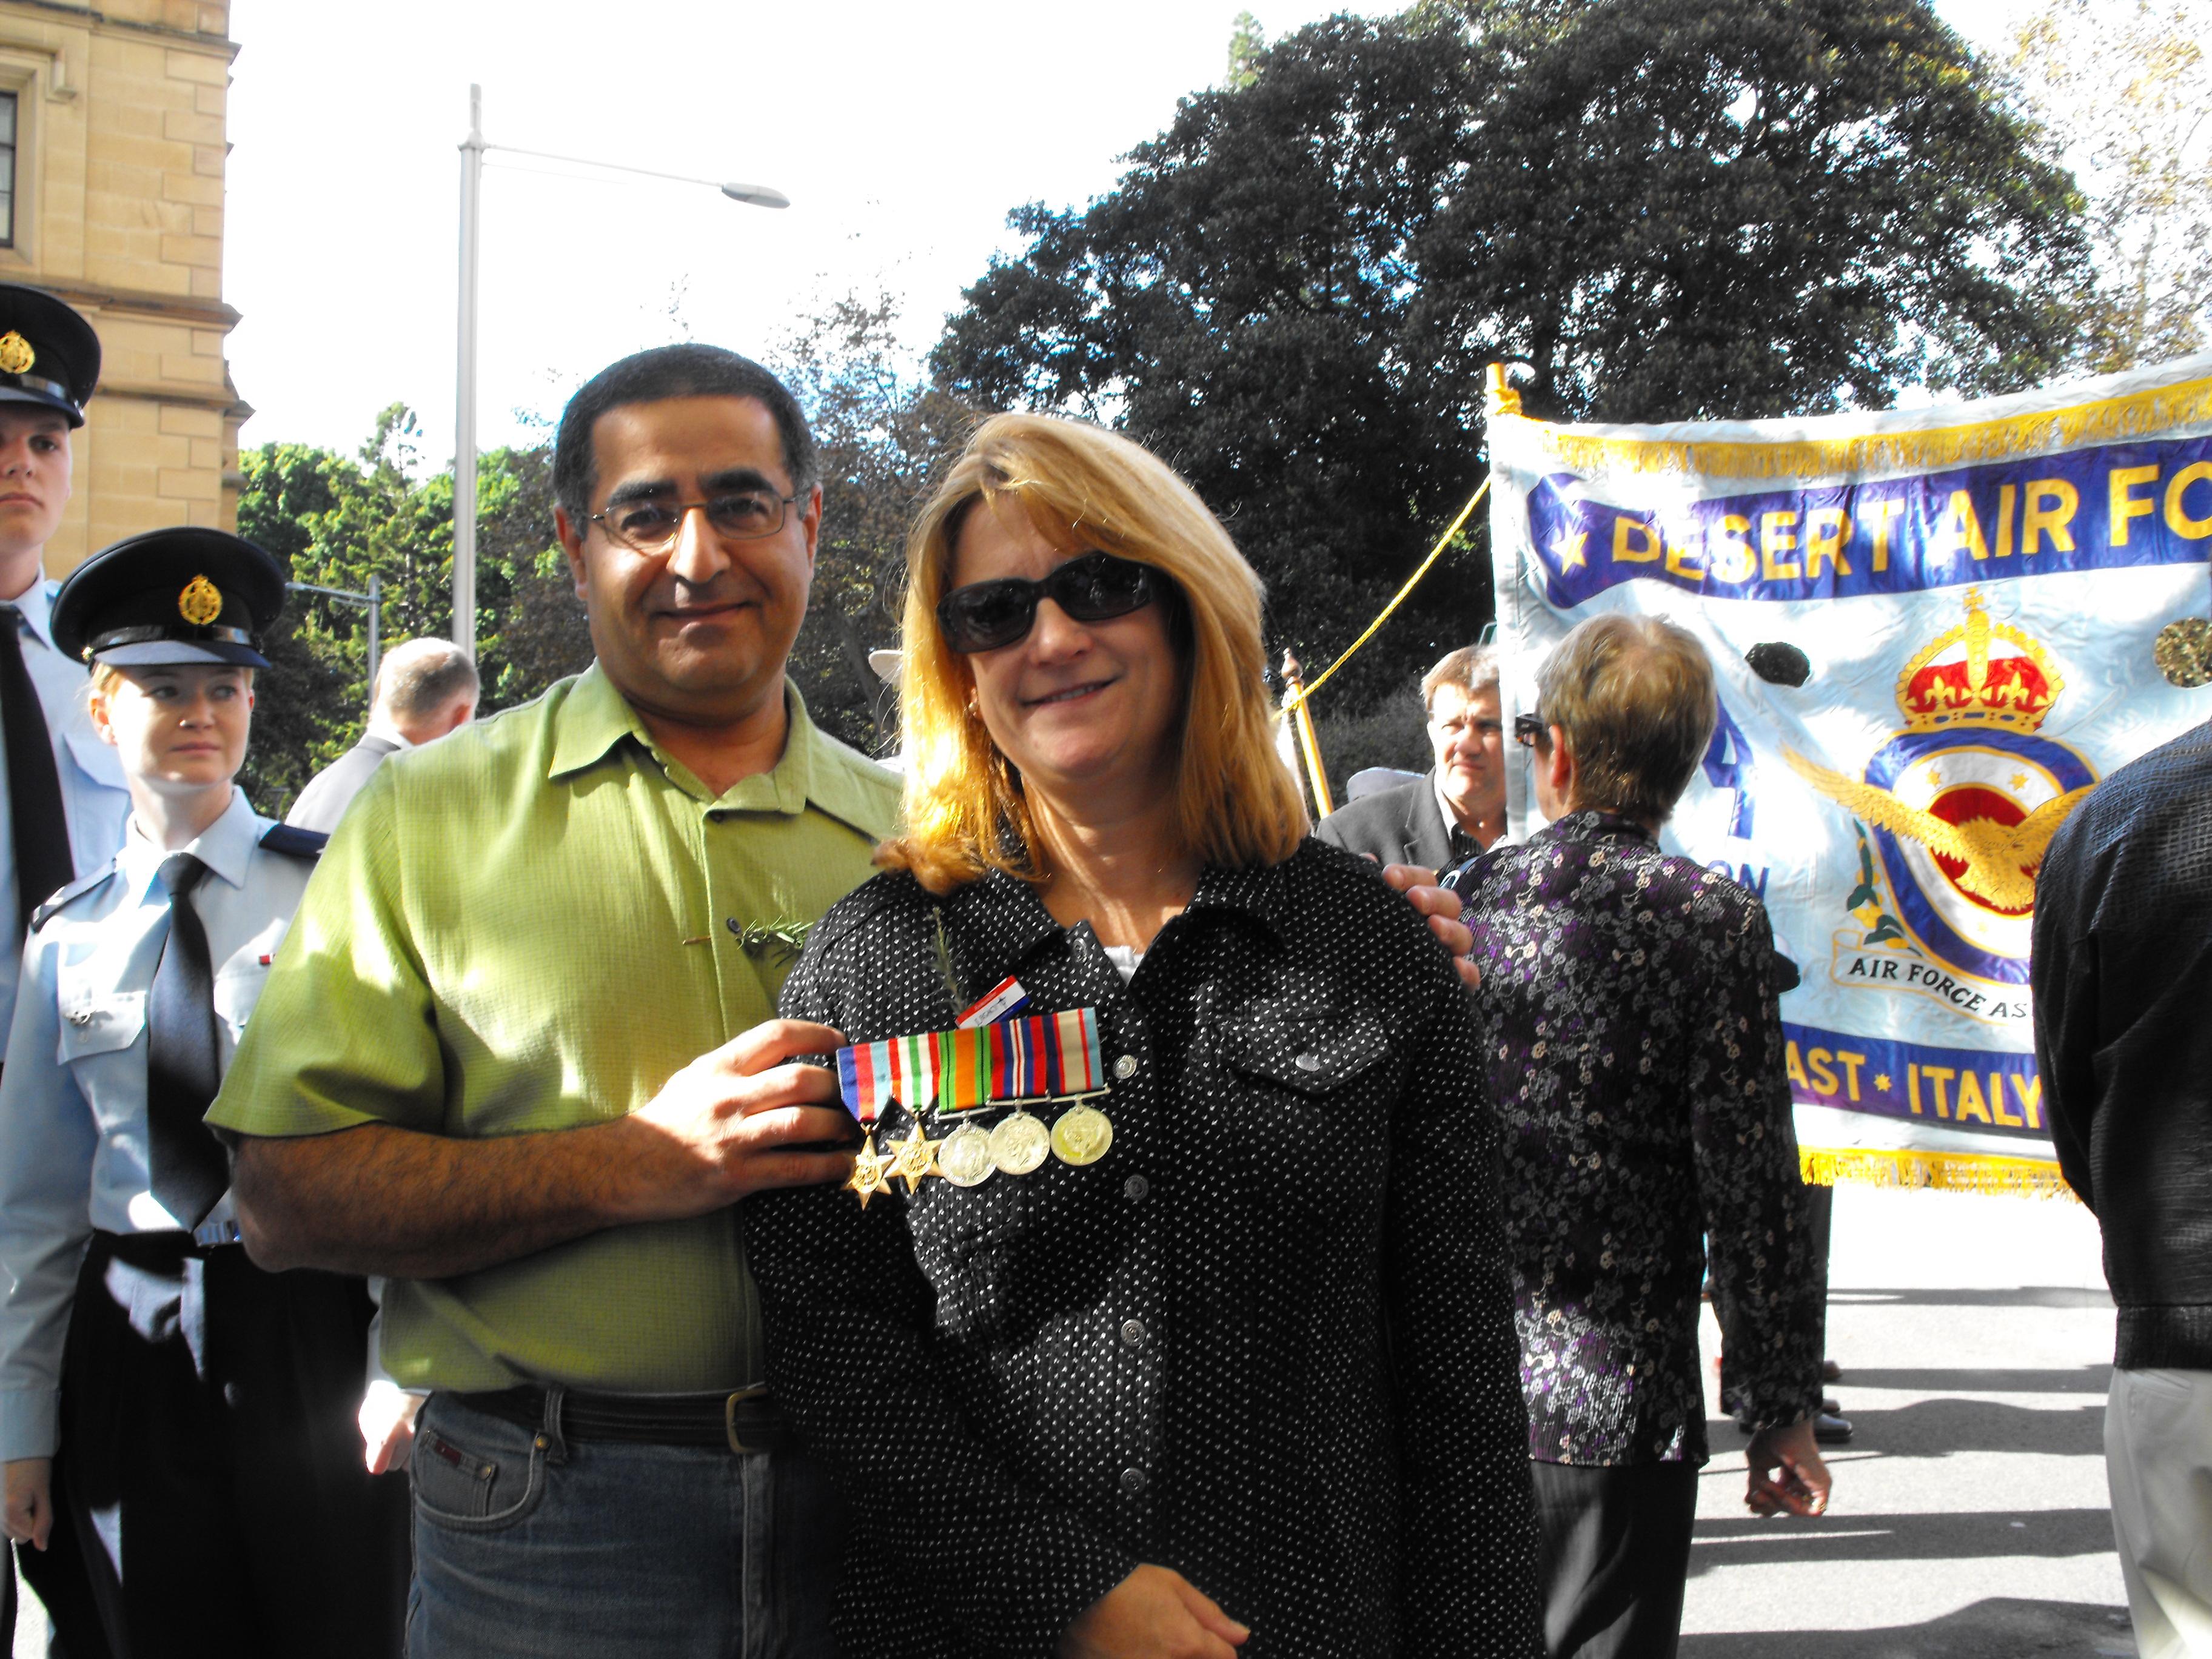 Michael and Pam Antonios